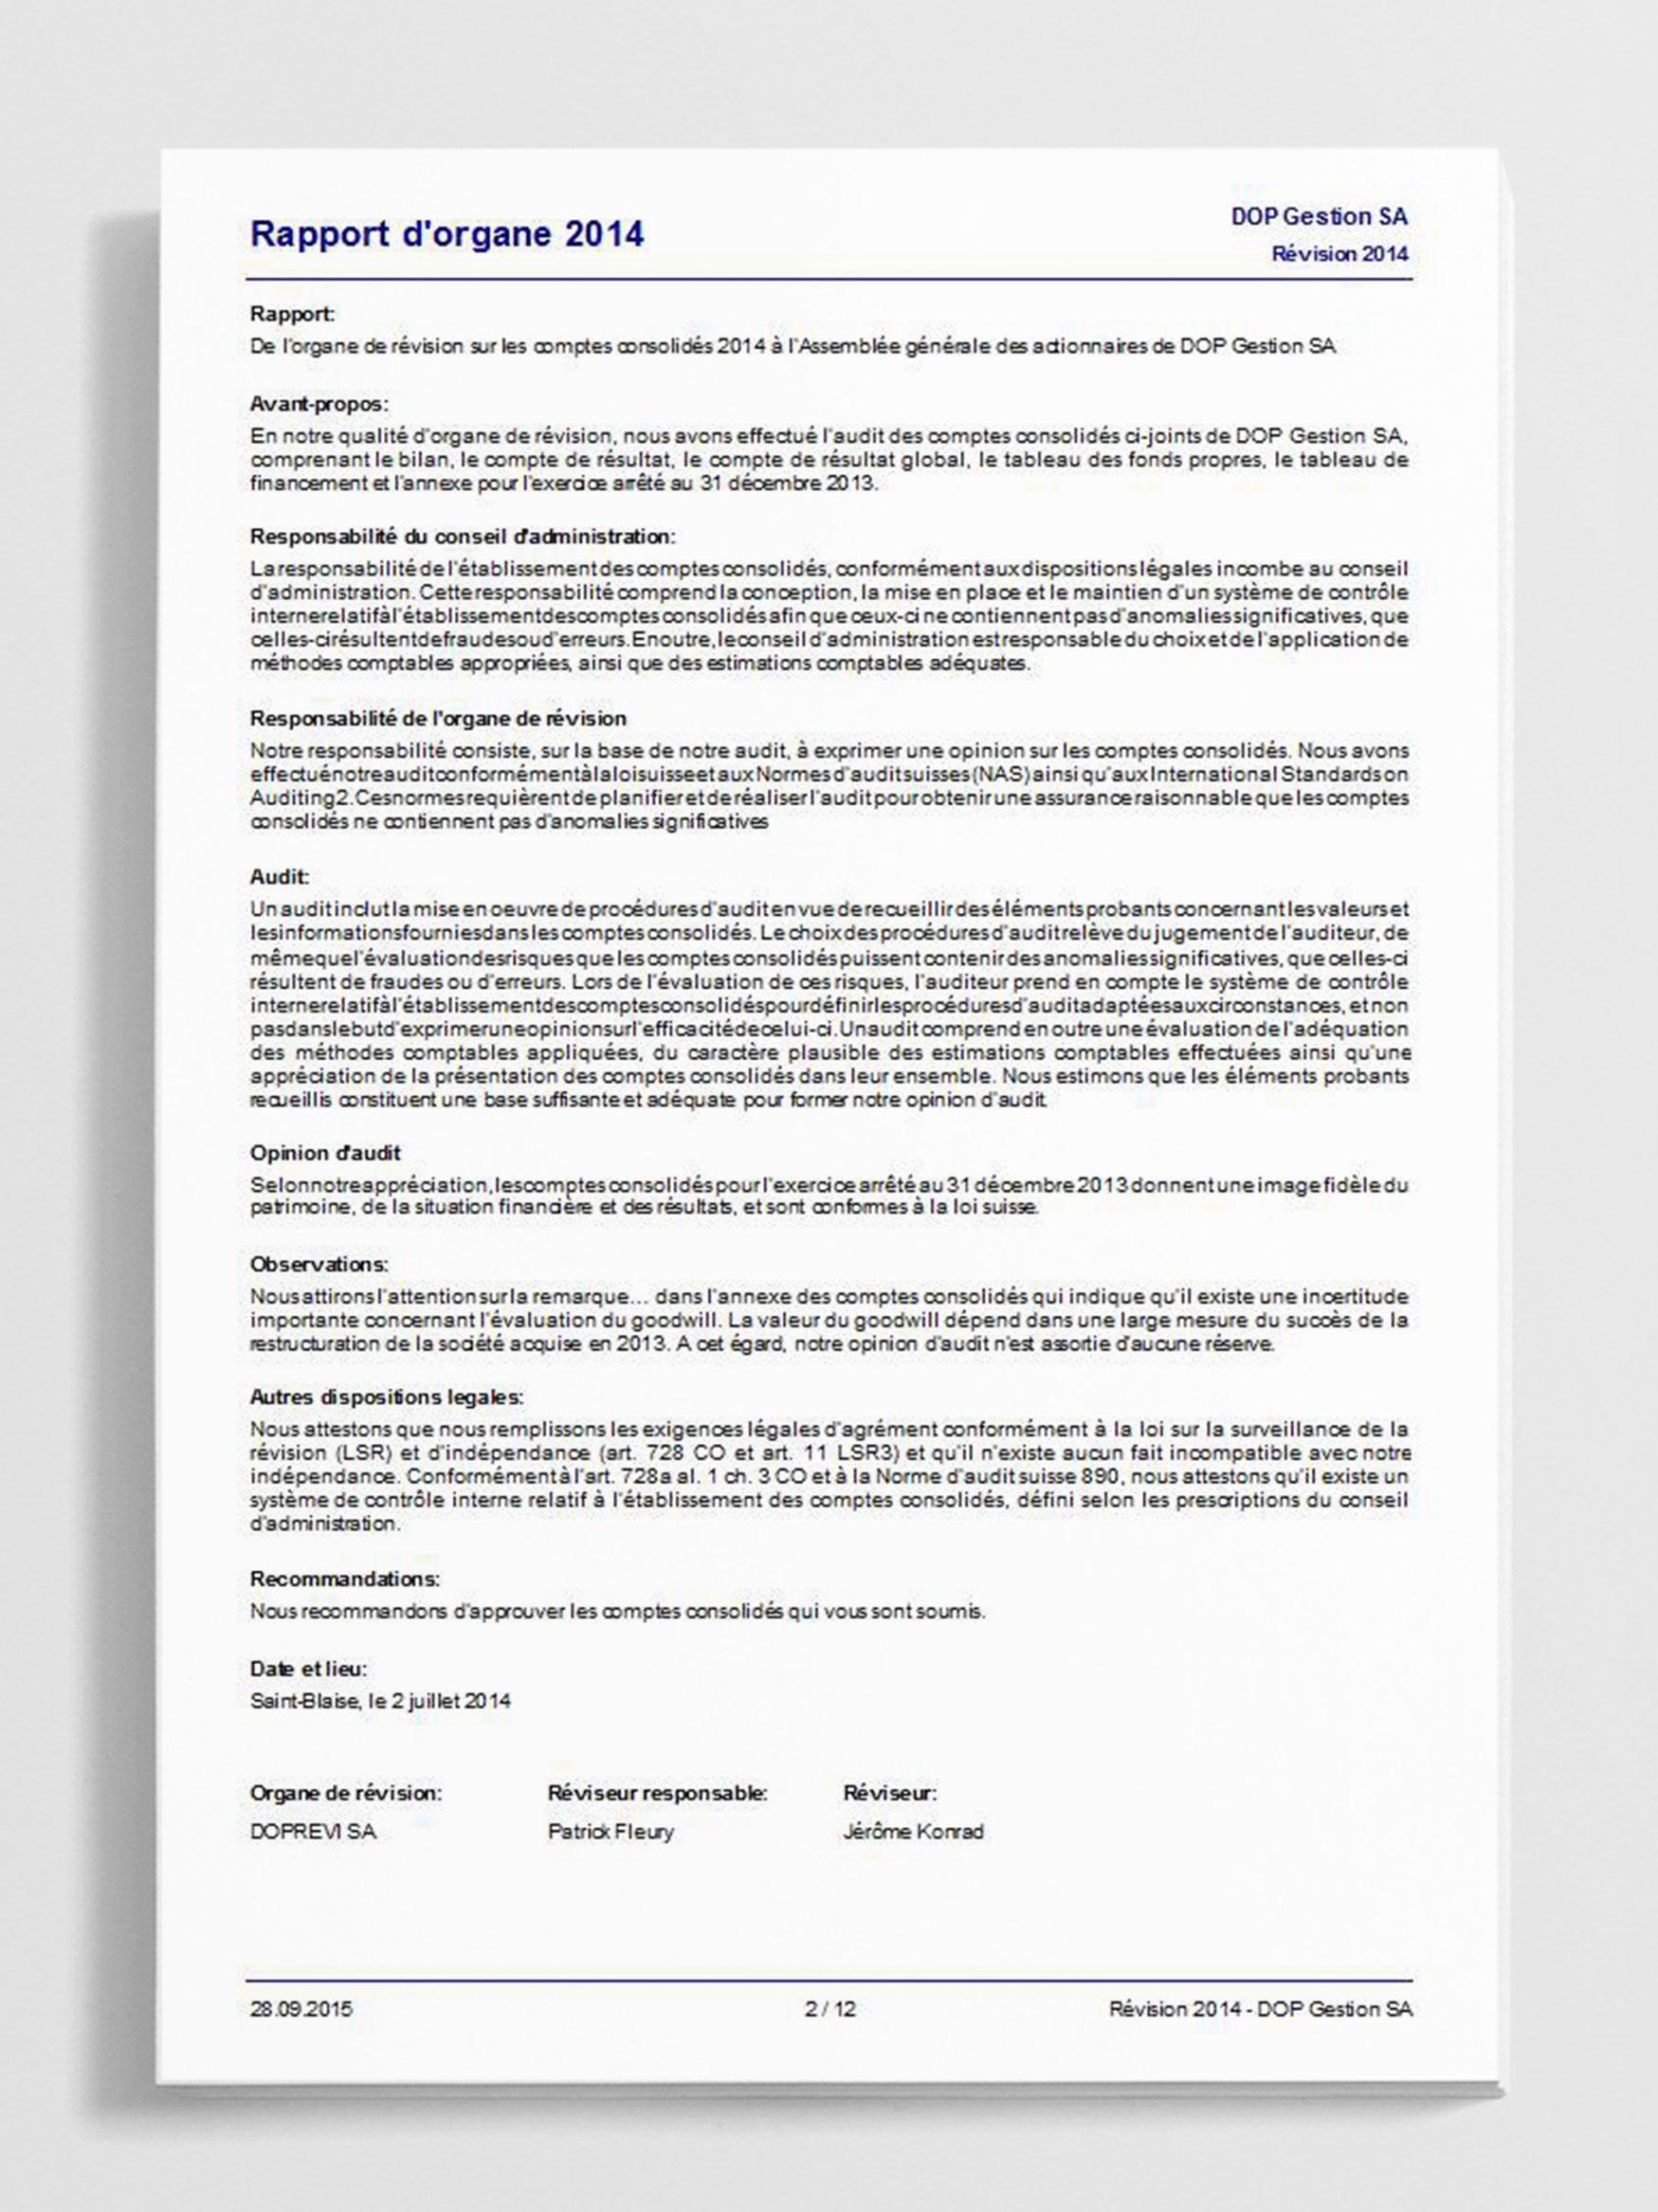 DOPG-Plan-Fiduciaire-Rapport-organ